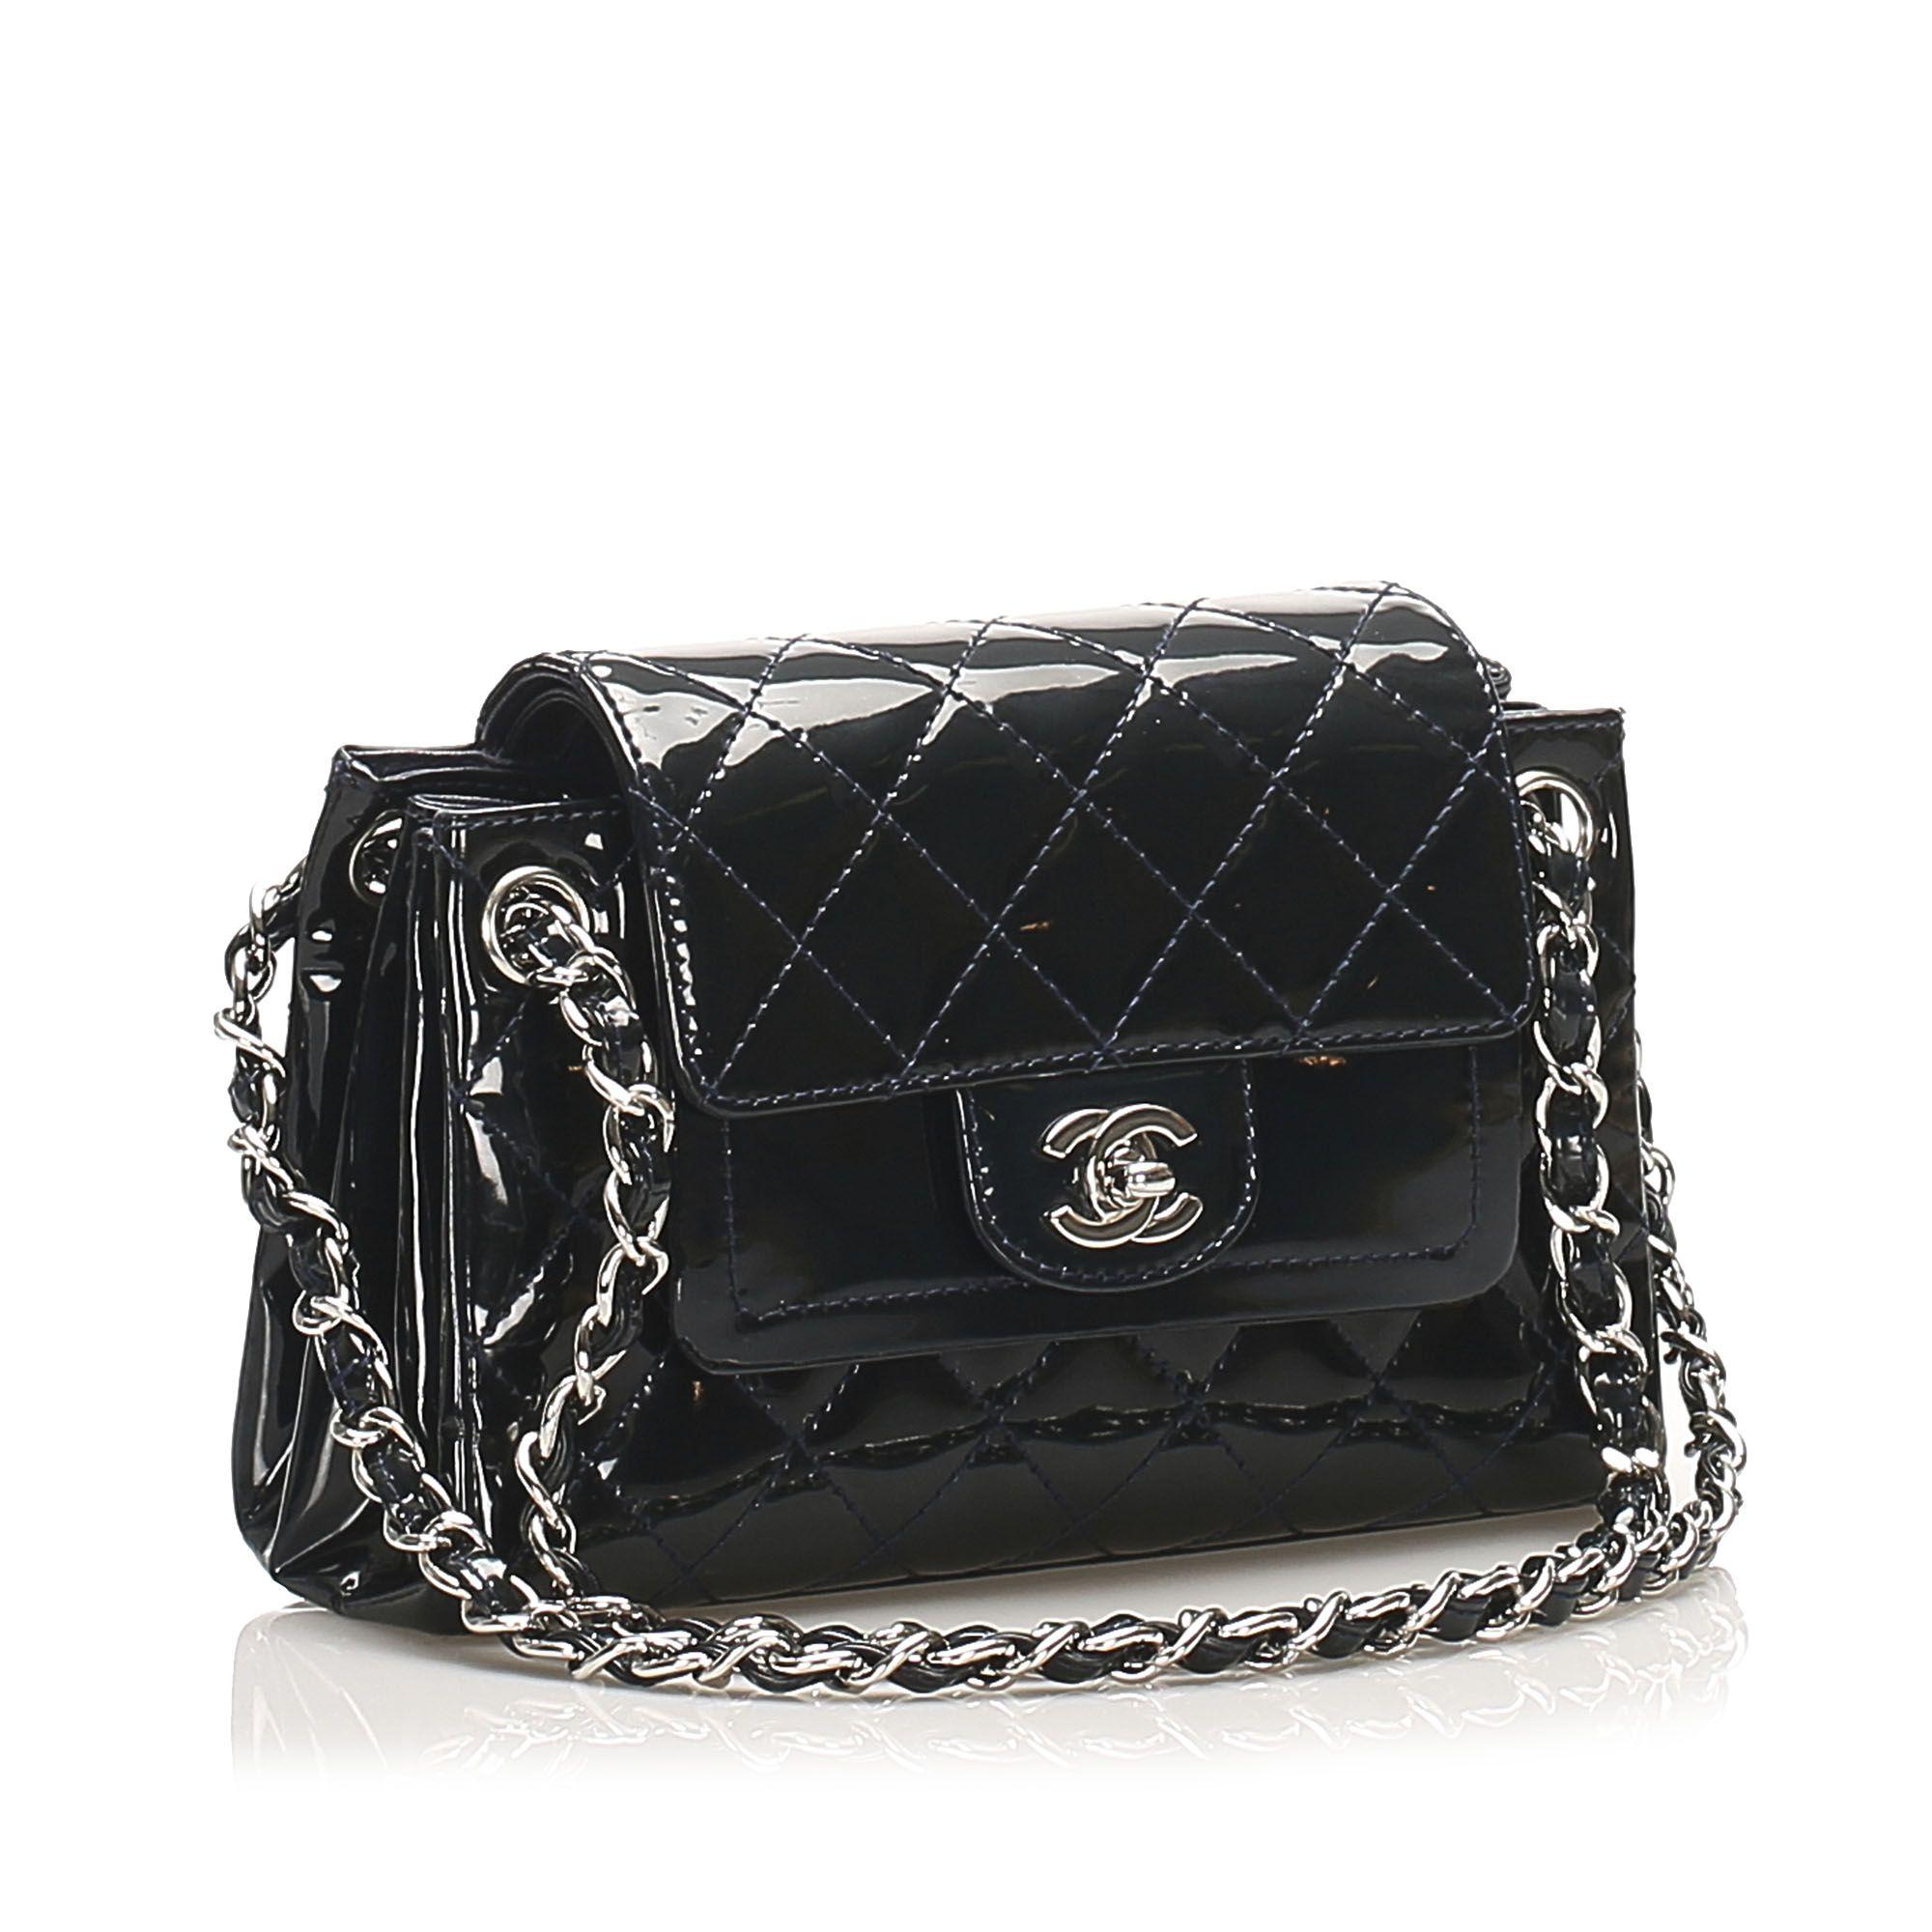 Vintage Chanel Accordion CC Timeless Patent Leather Shoulder Bag Blue